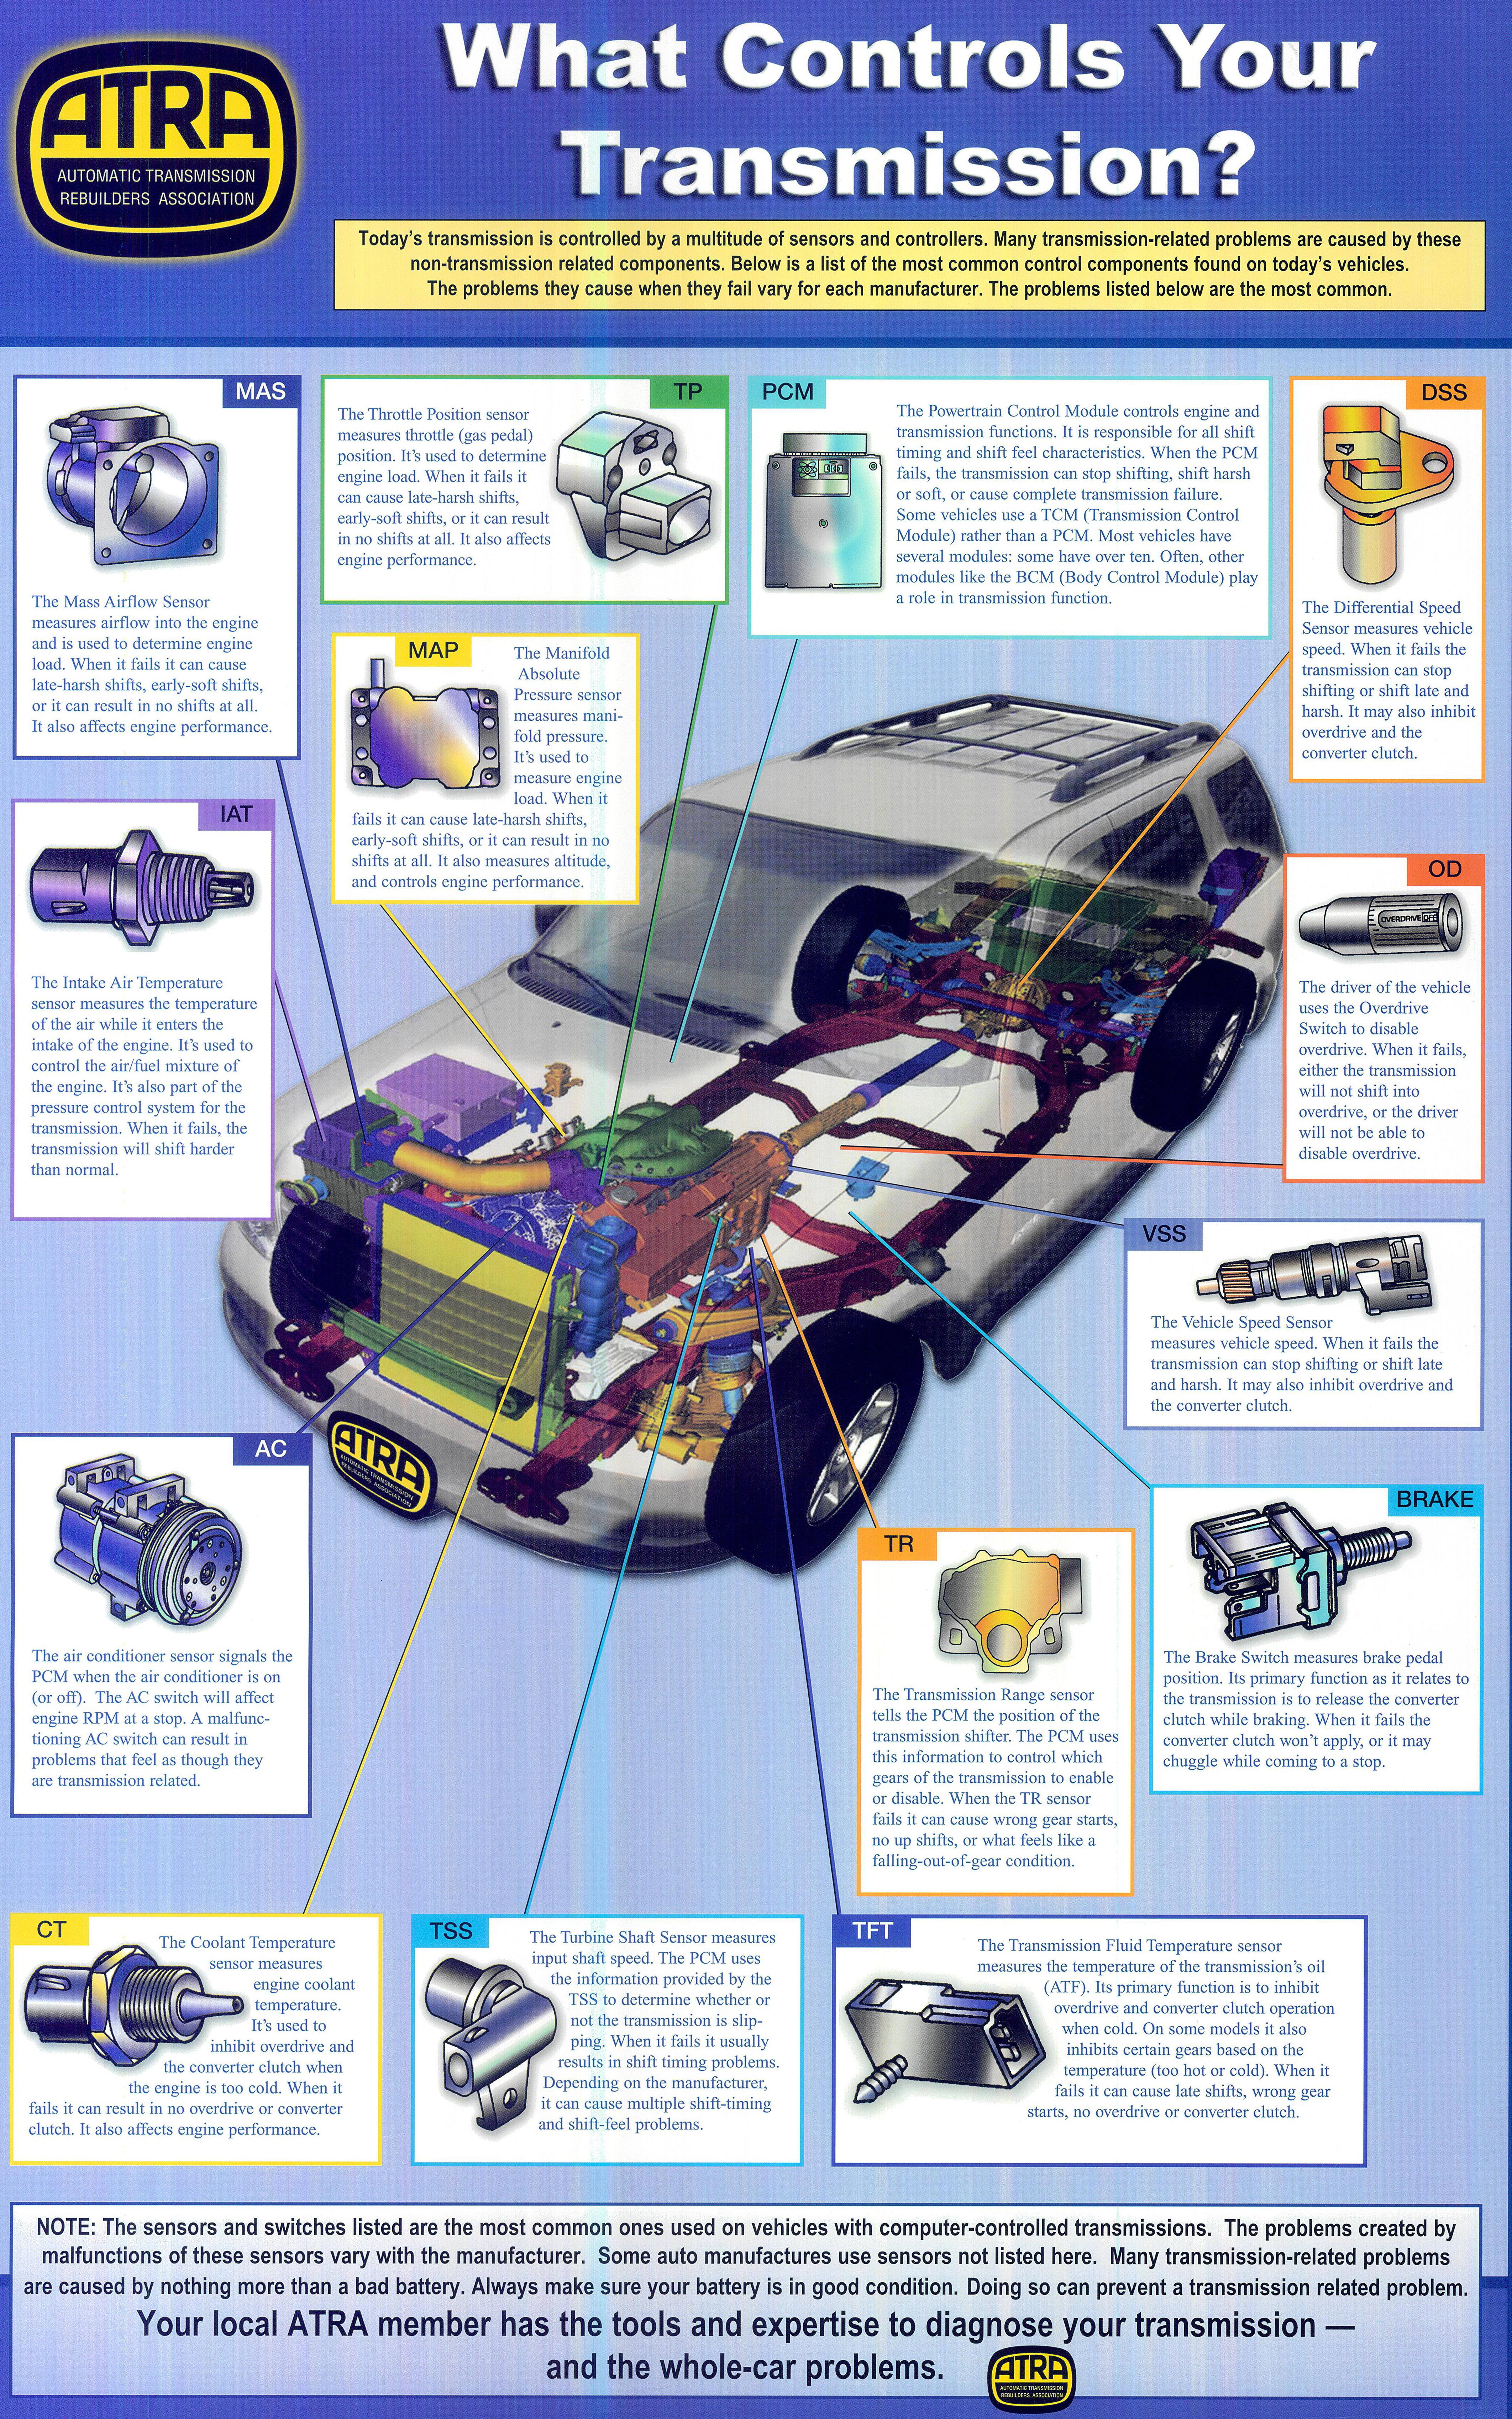 Uncle D's Transmissions & Auto Repair | Auto Repair Hollywood FL